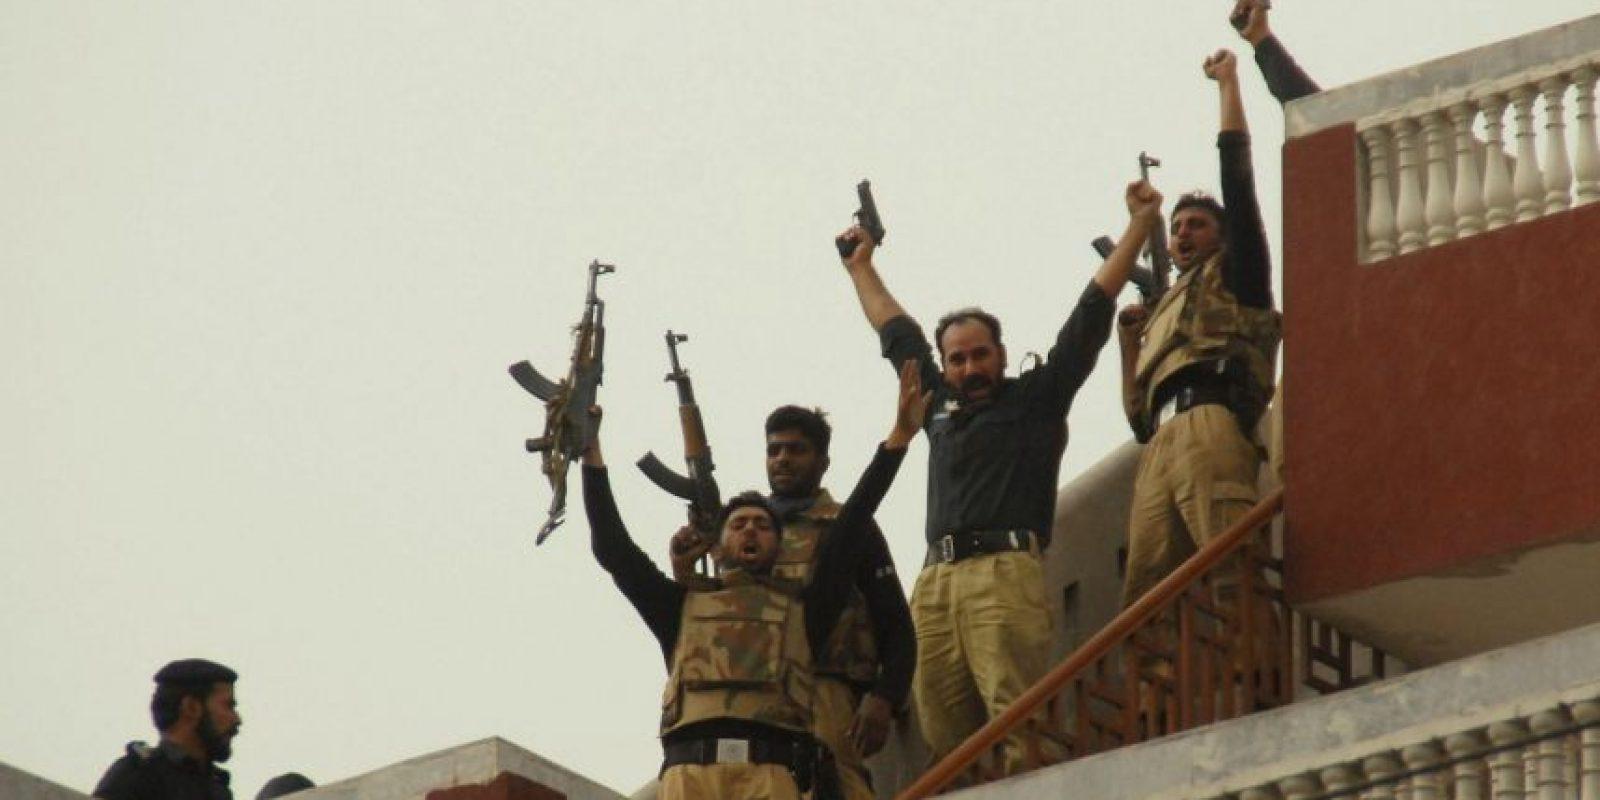 Estados Unidos le designó como organización terrorista en diciembre de 2012. Foto:Getty Images. Imagen Por: